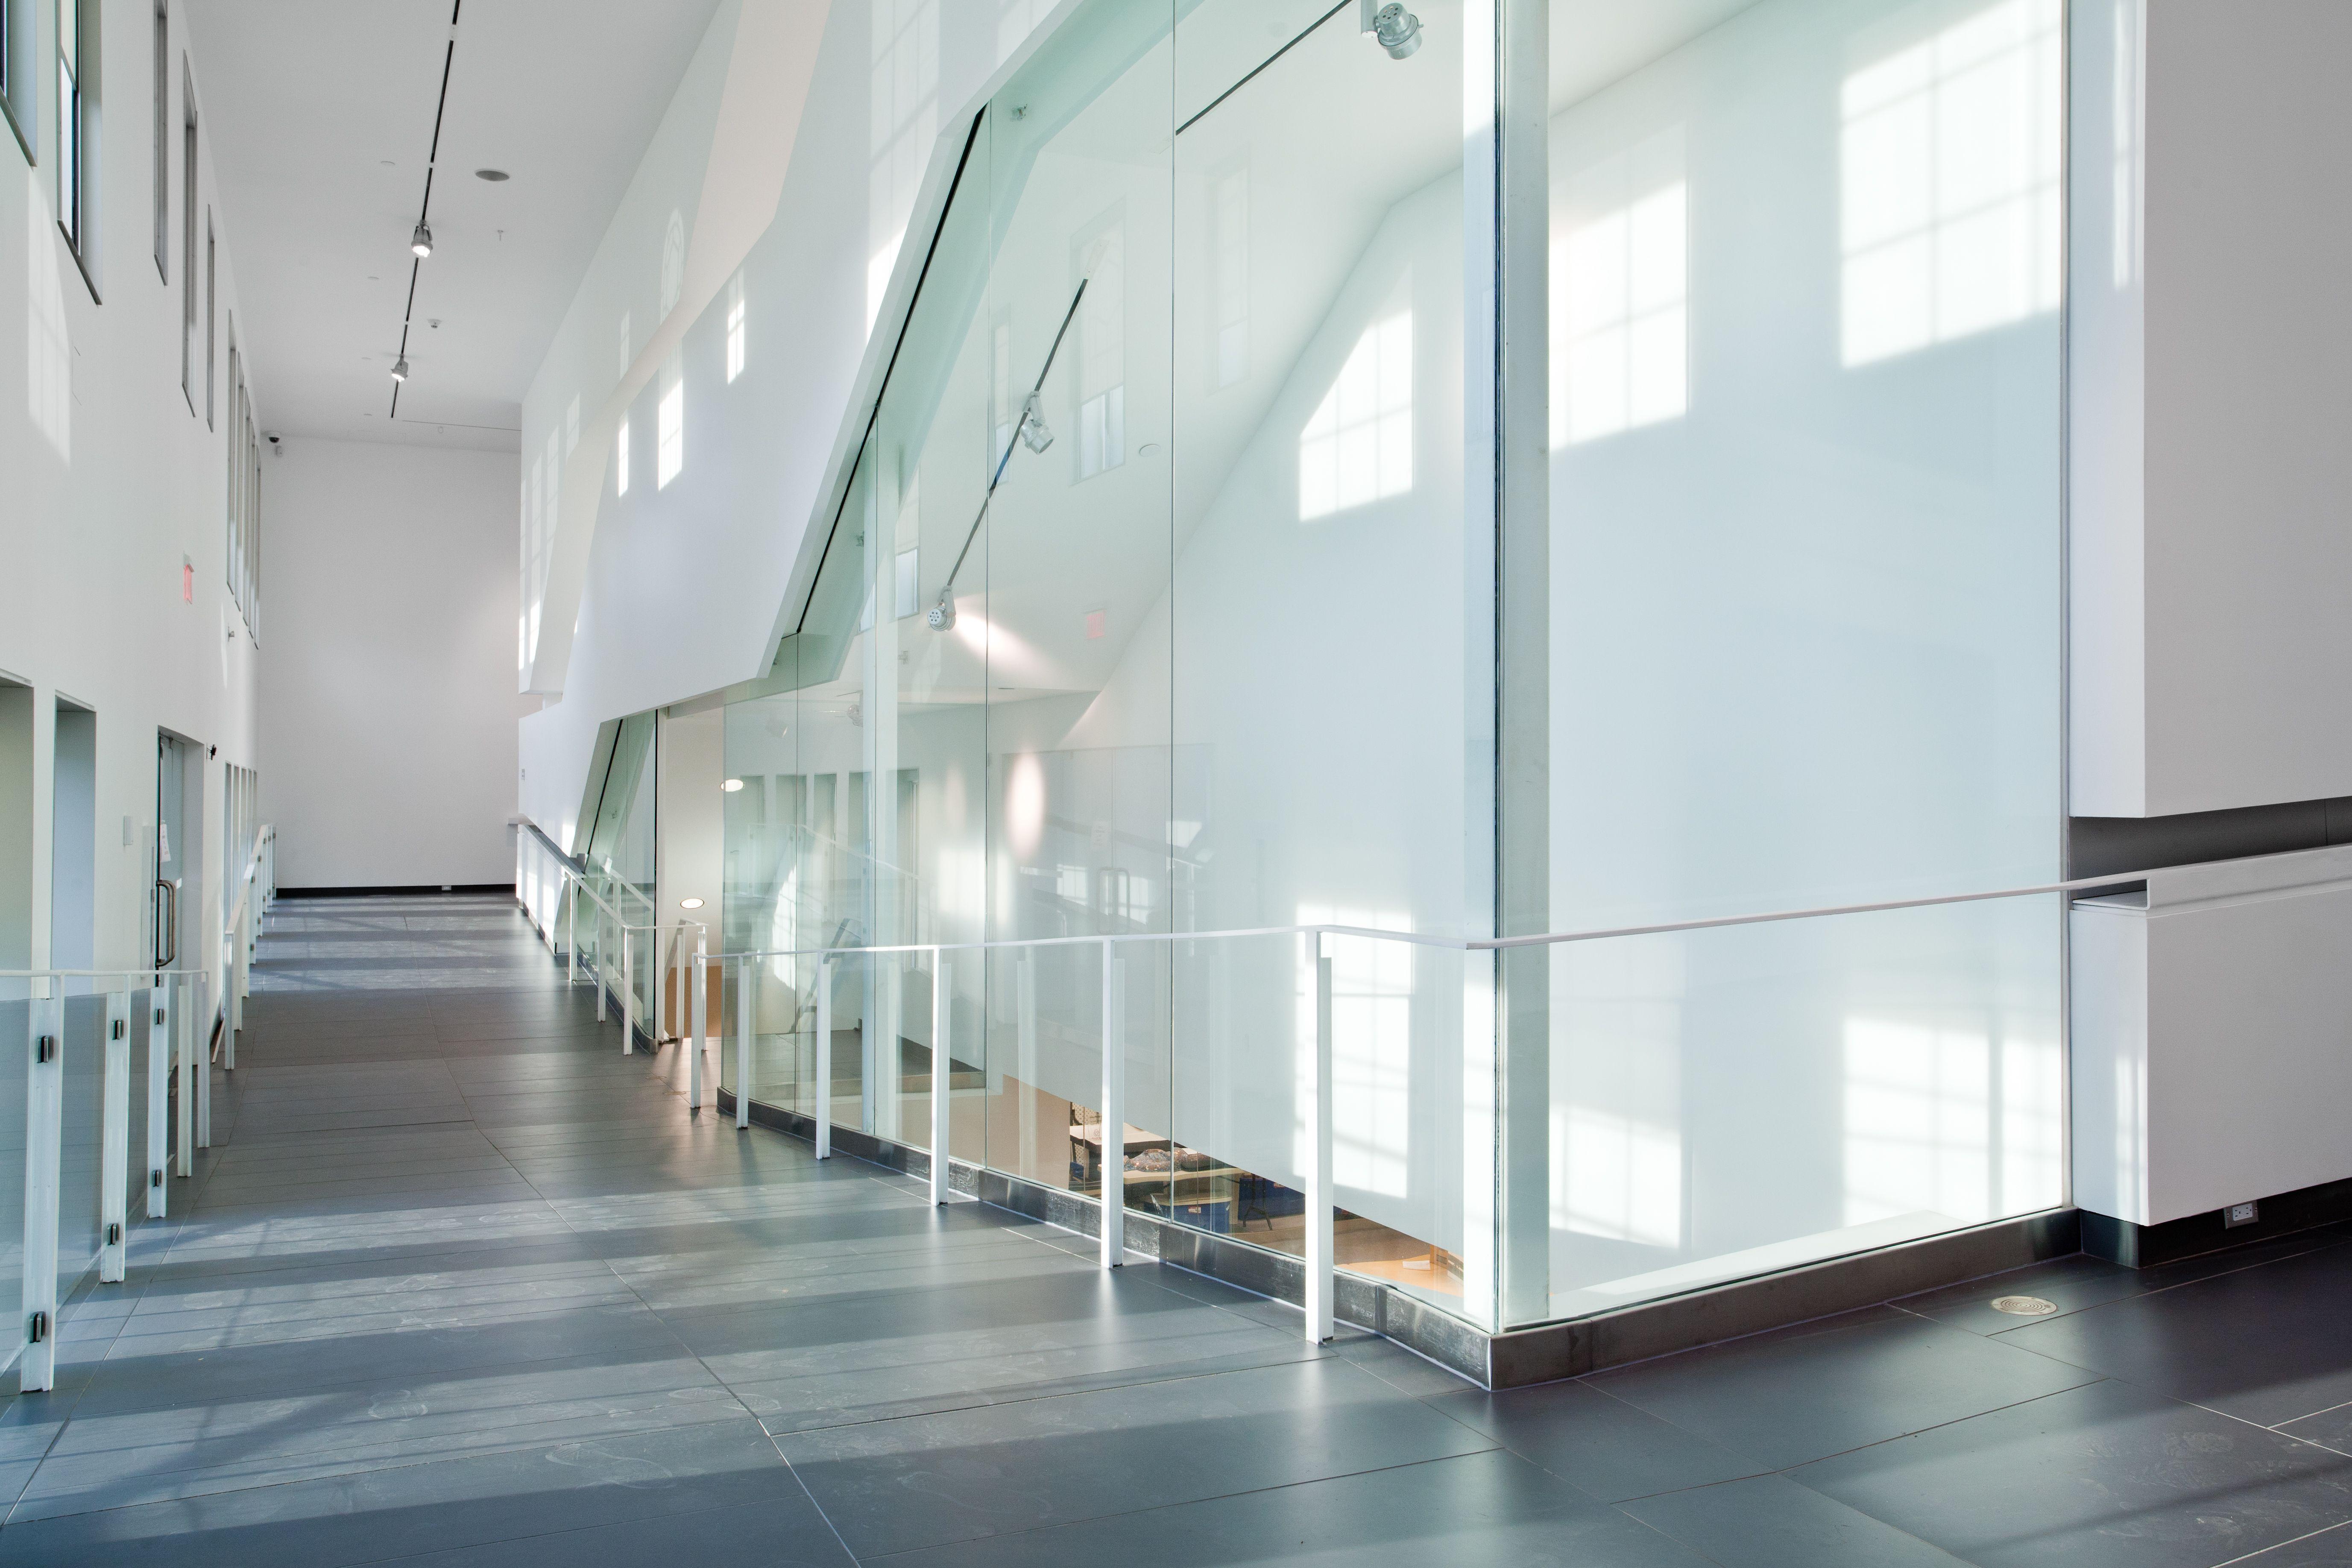 Art gallery of grande prairie interior view prairie